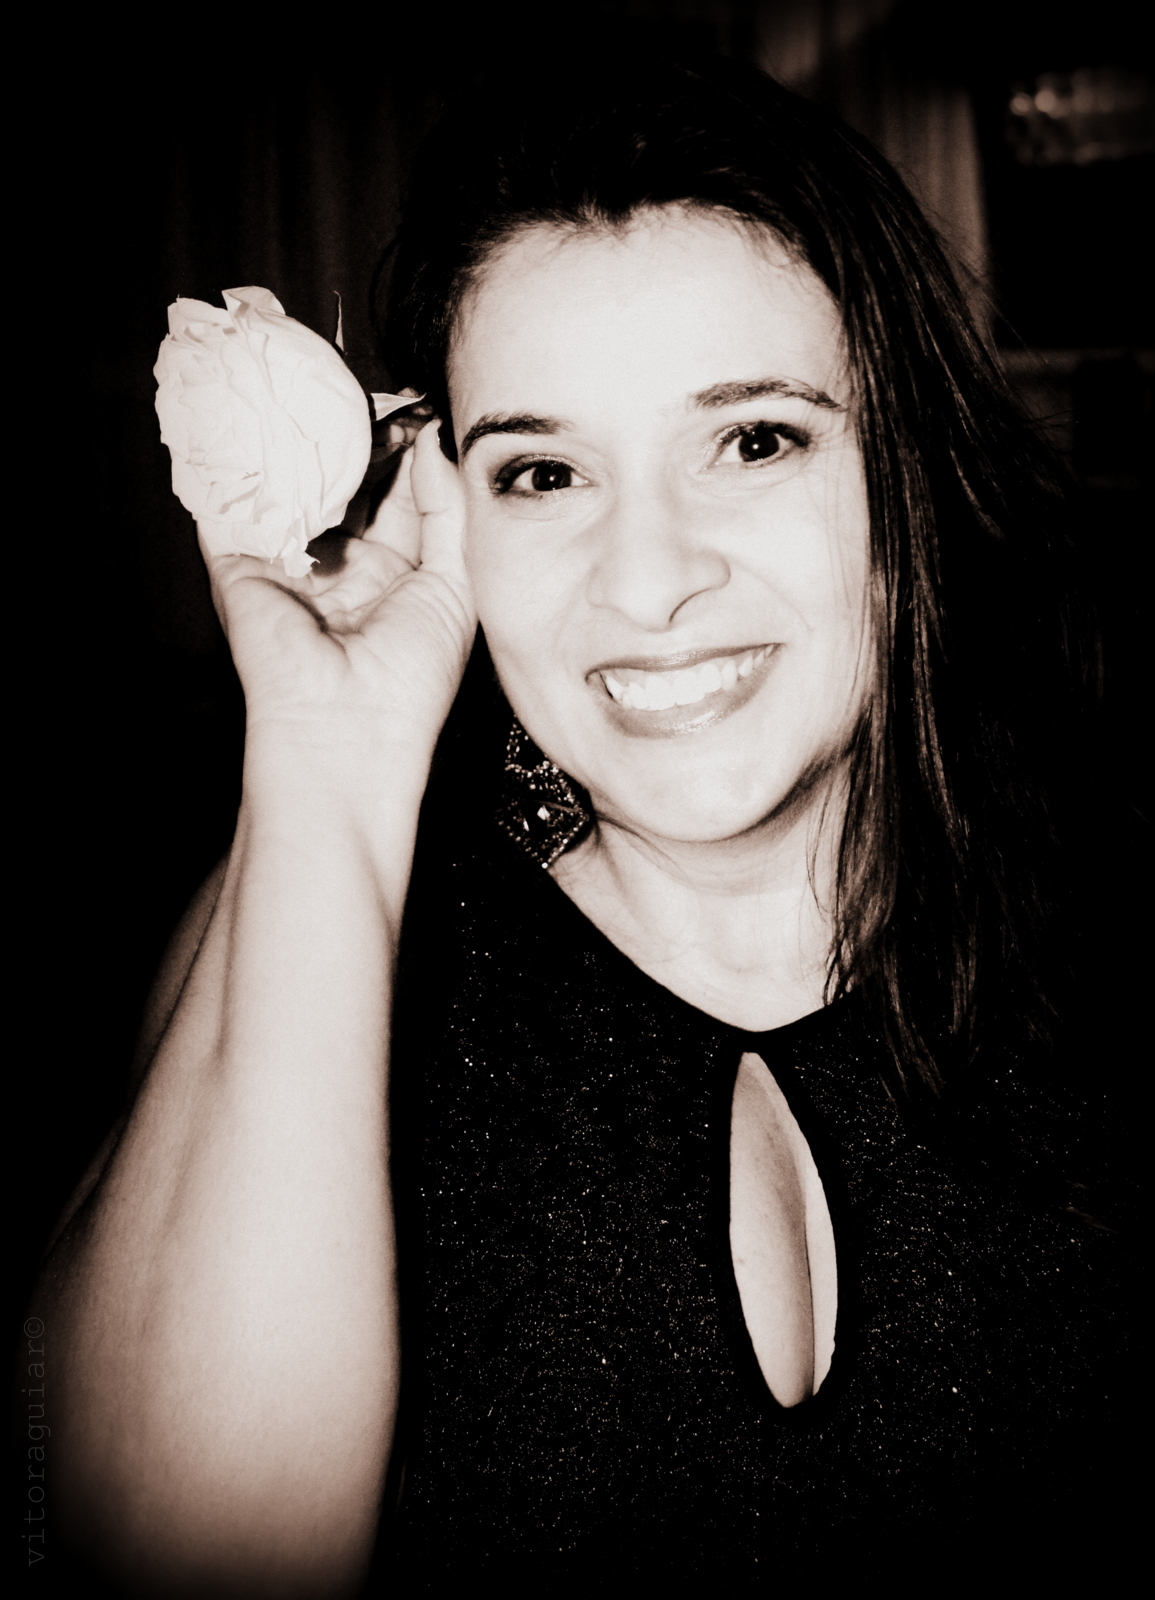 Andréa Barletta